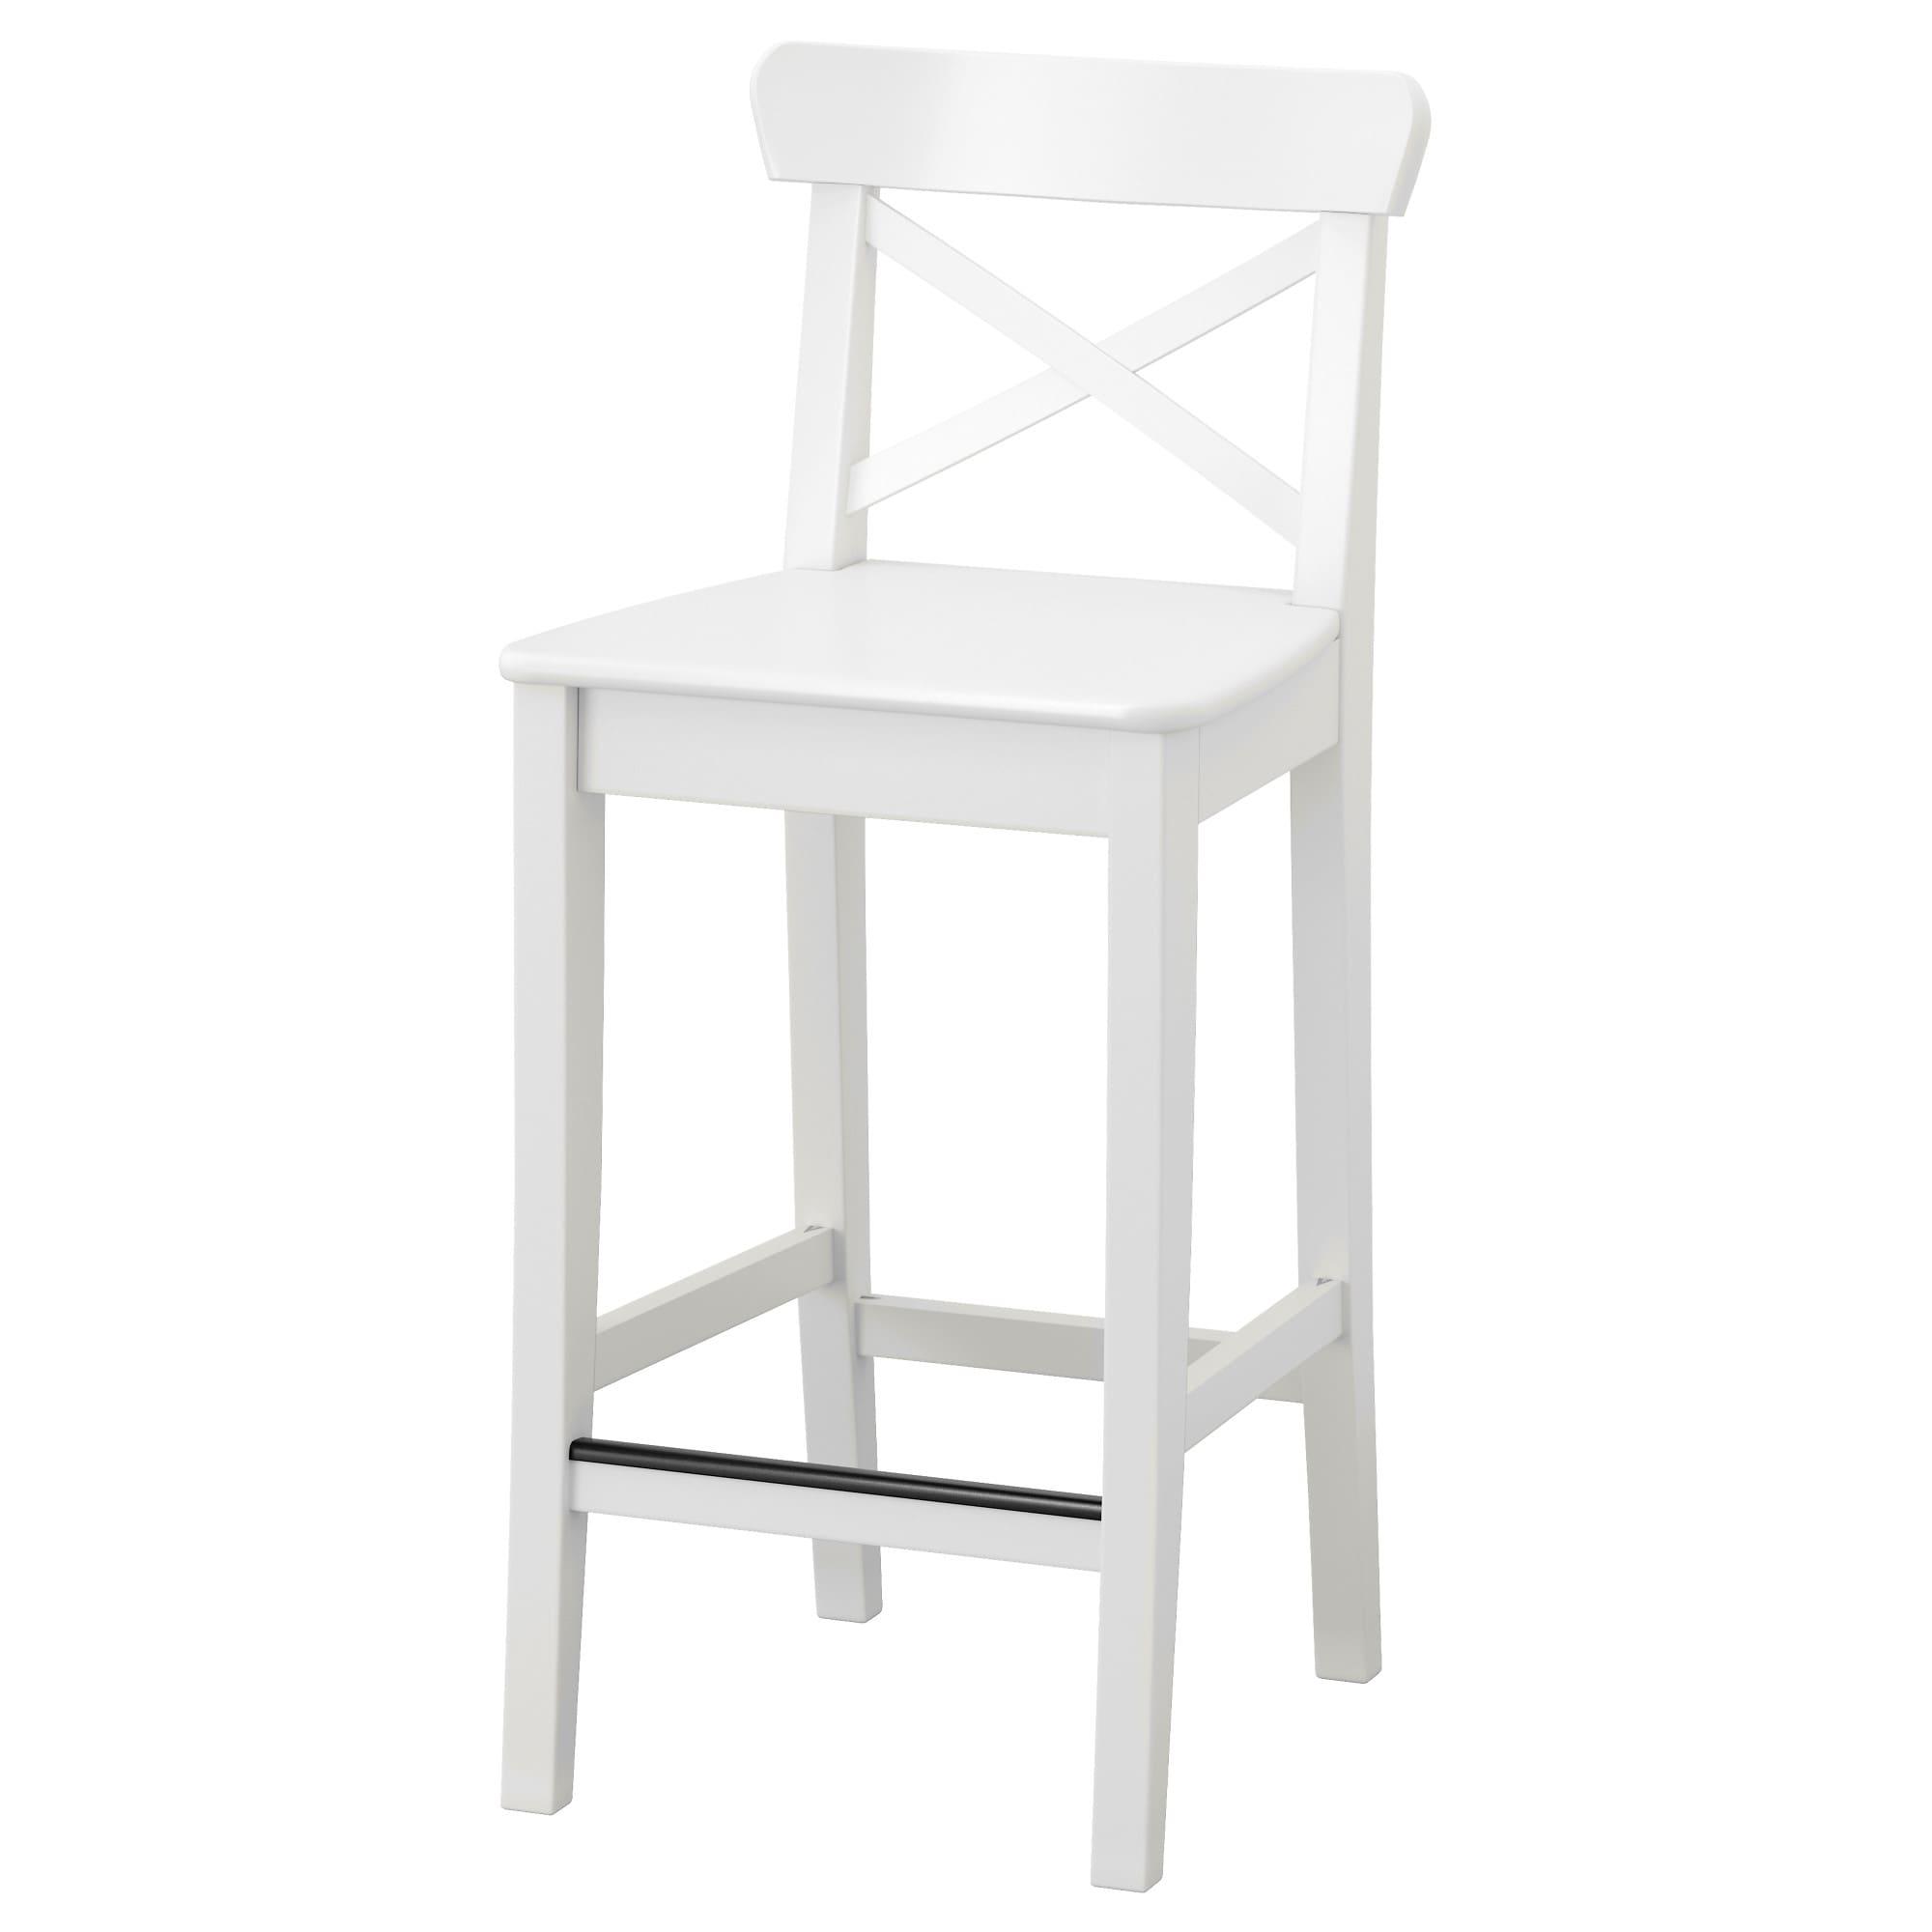 chaise ingolf